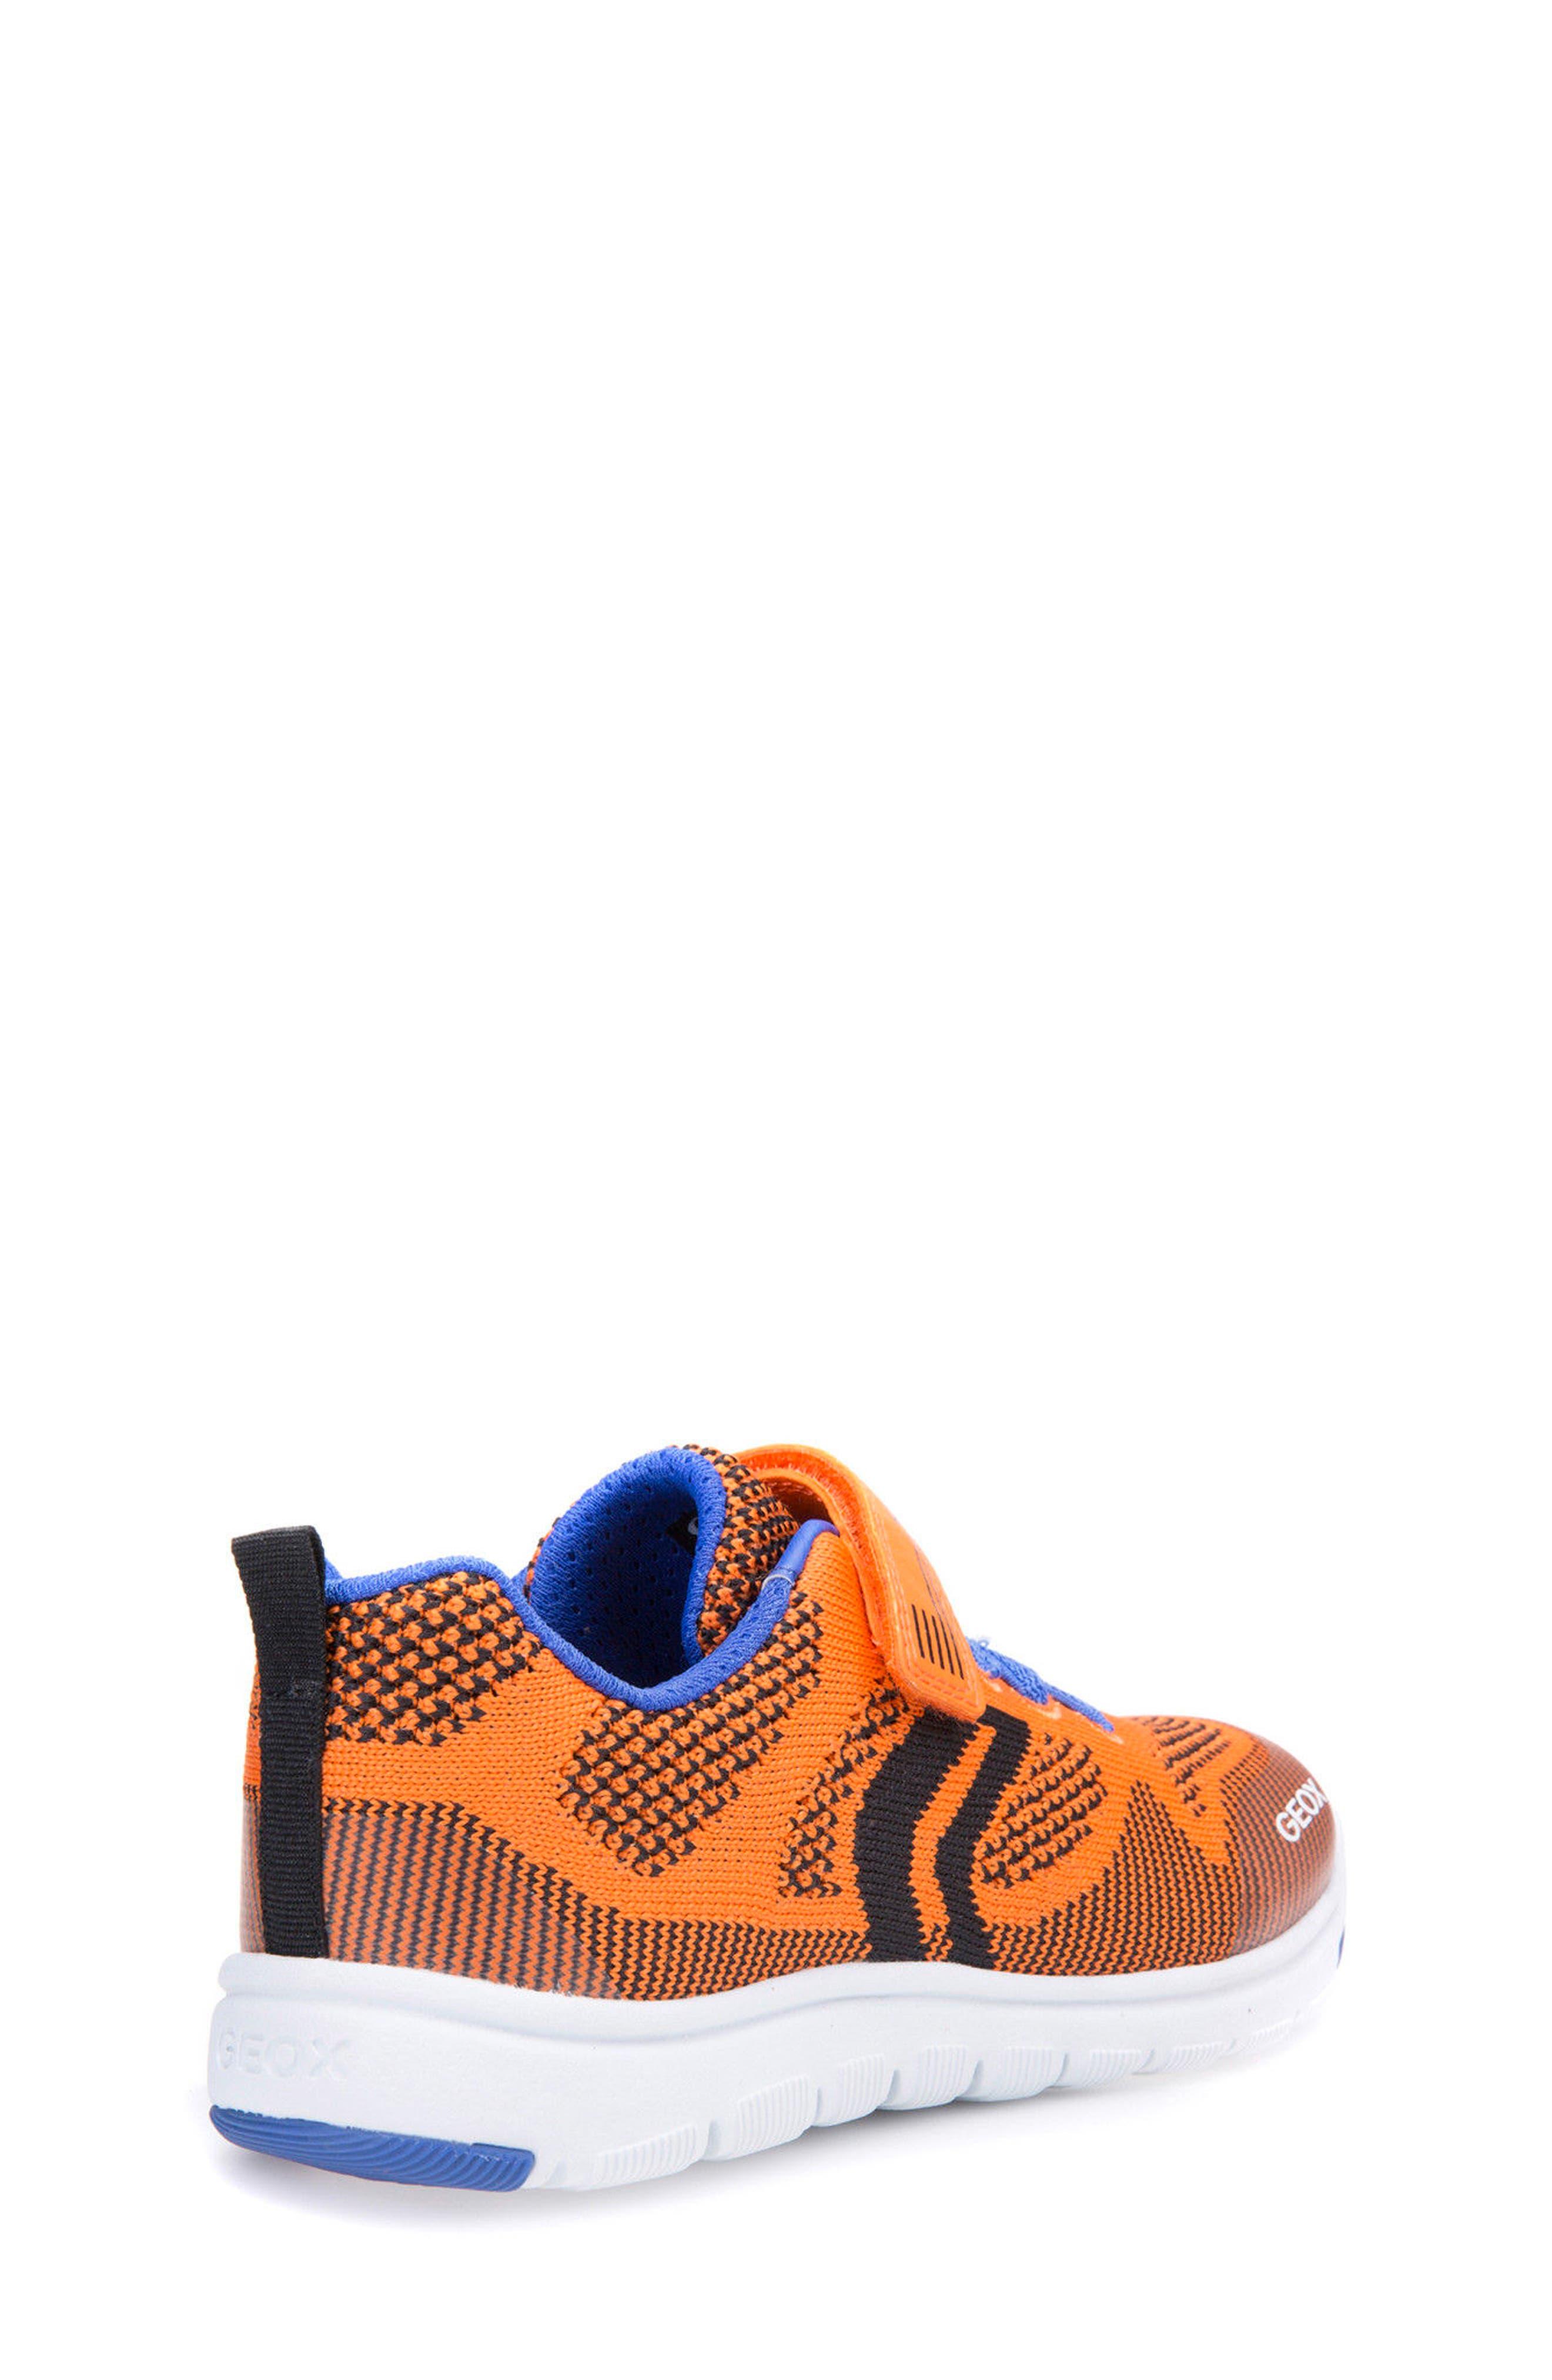 Xunday Low Top Woven Sneaker,                             Alternate thumbnail 3, color,                             Orange/ Royal